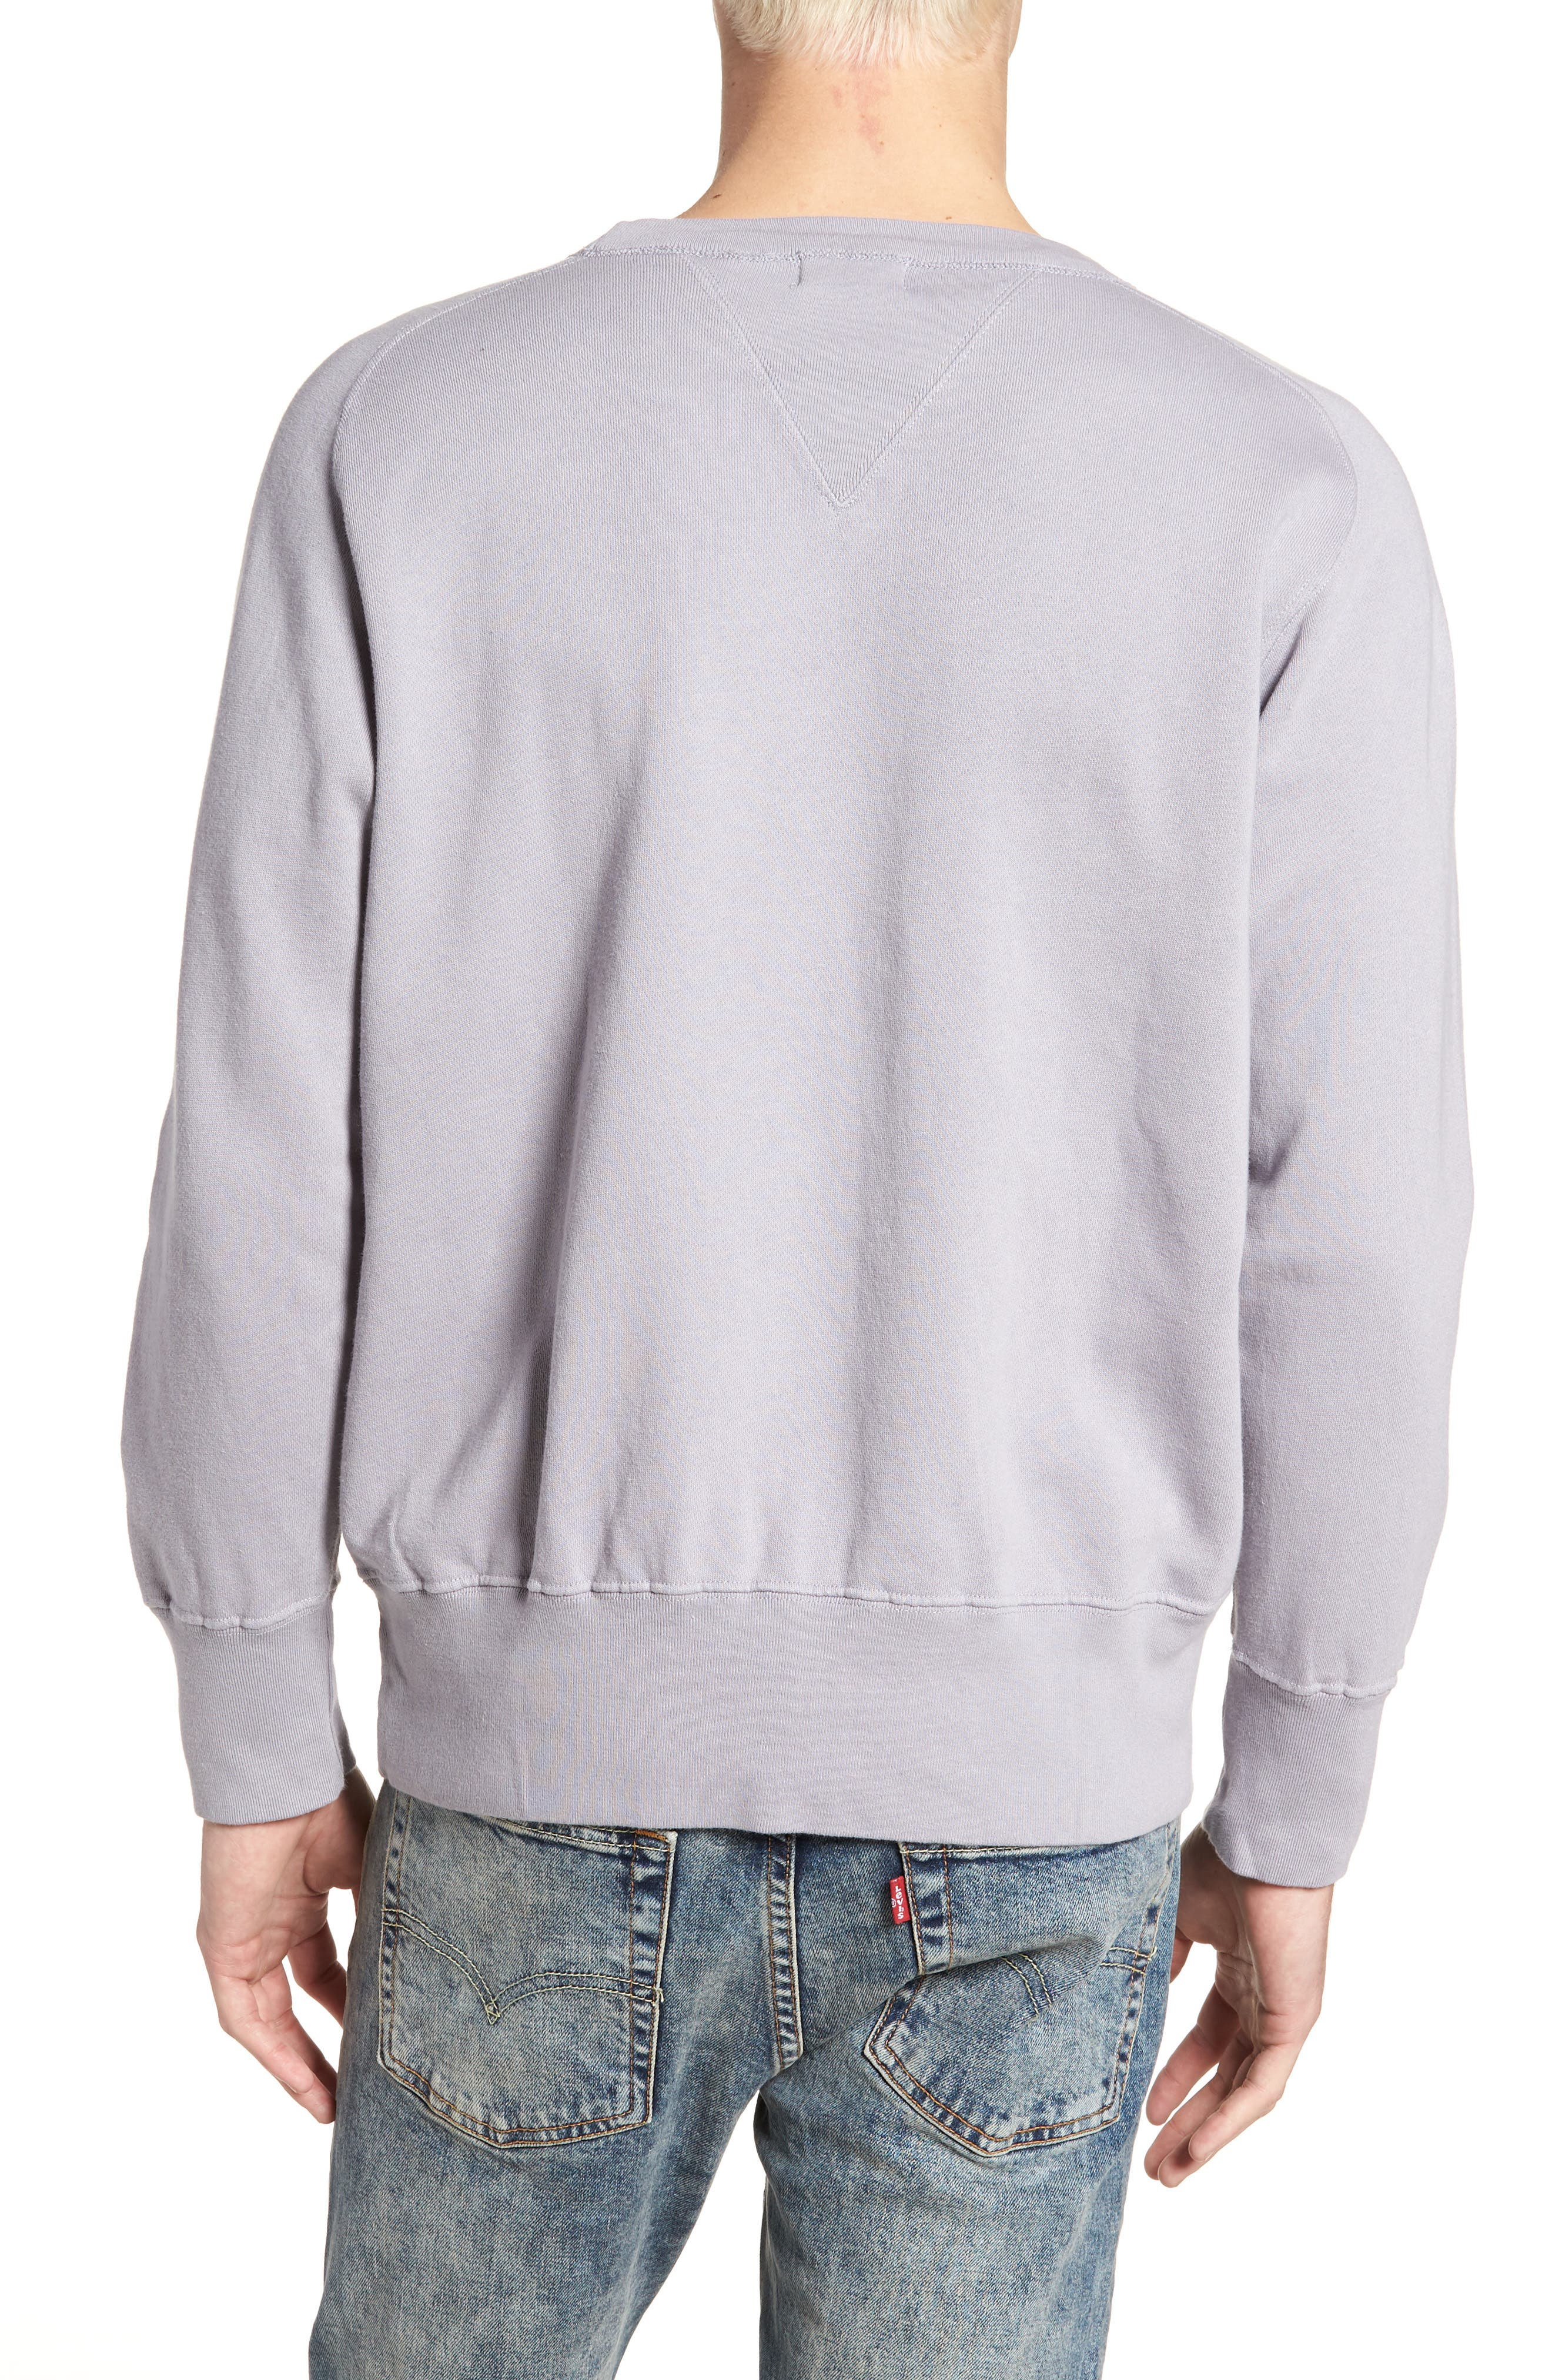 Bay Meadows Sweatshirt,                             Alternate thumbnail 2, color,                             Quiksilver